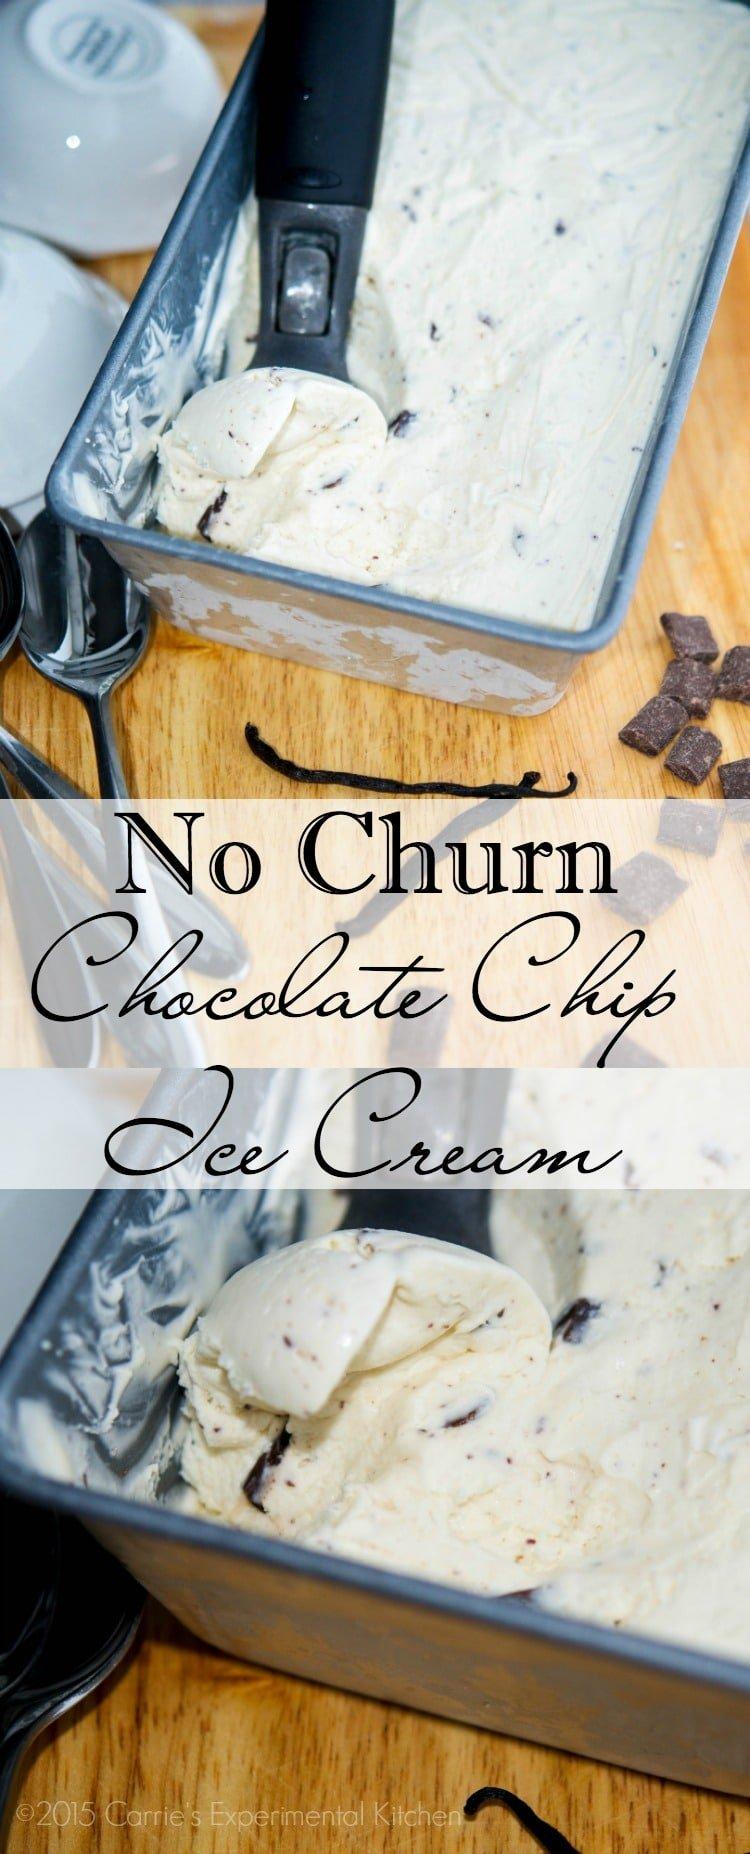 chocolate bar maker instructions